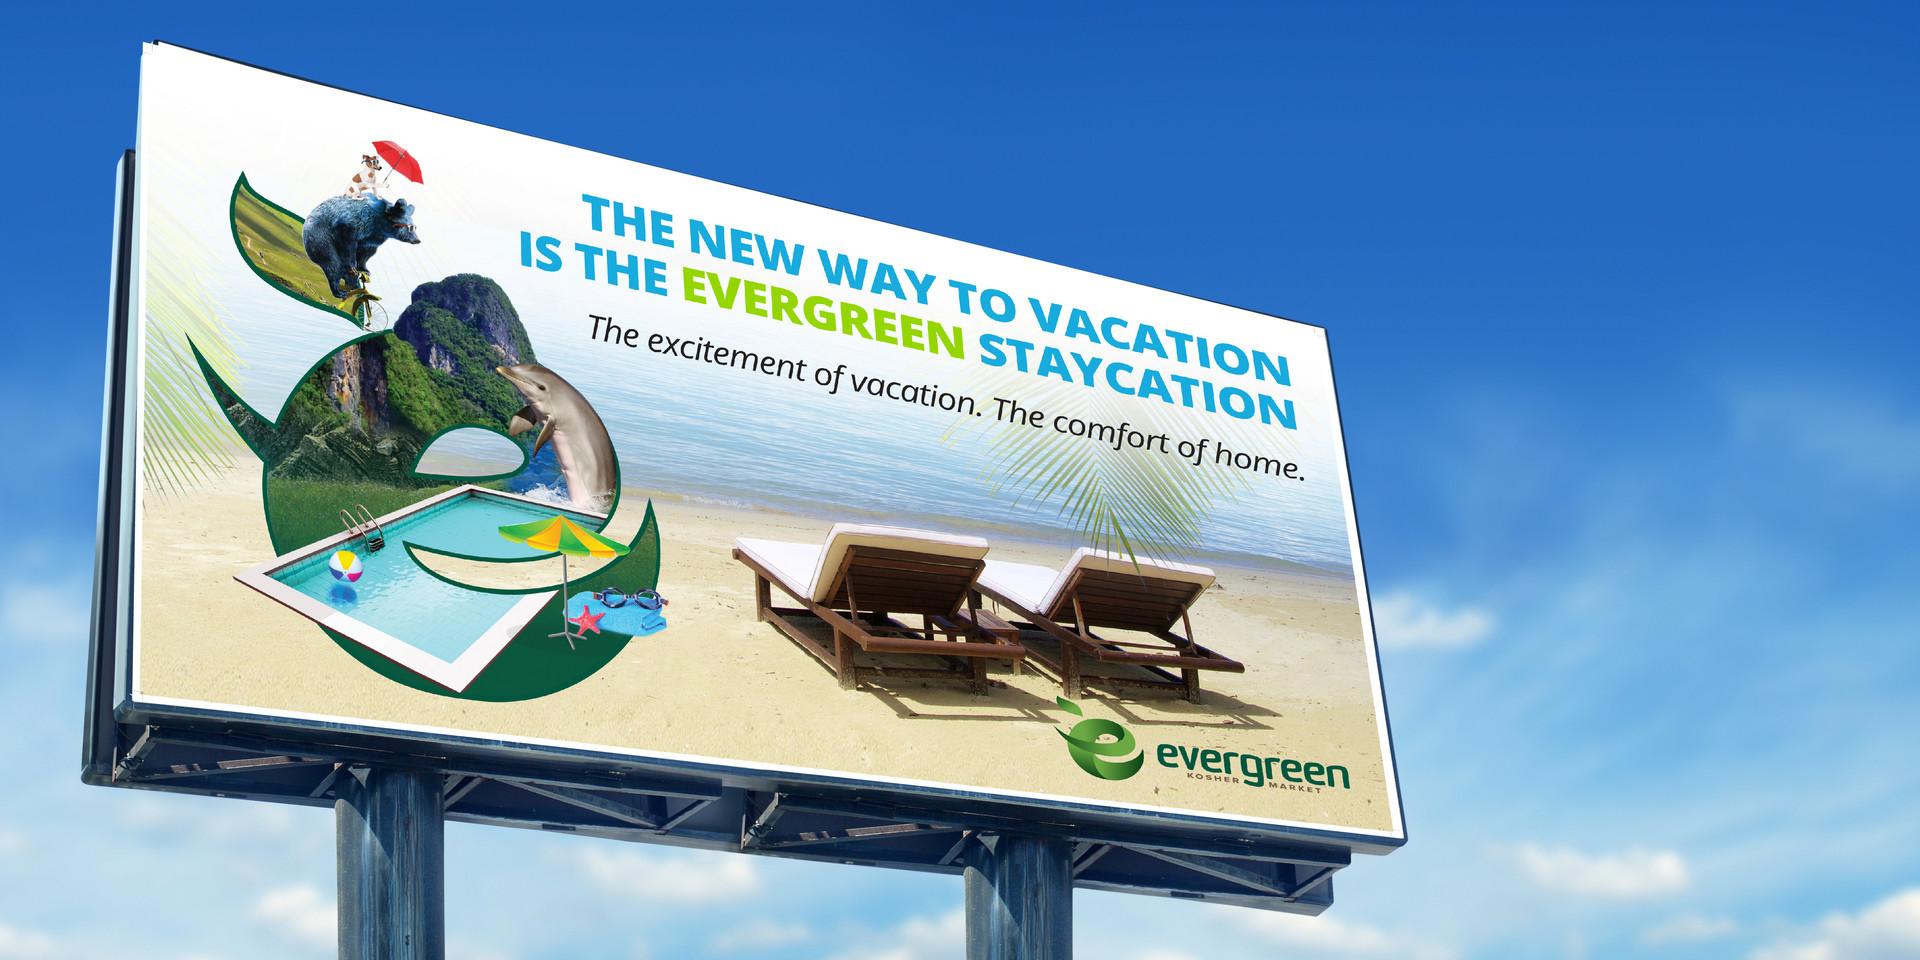 Evergreen Staycaytion Introductory Billboard